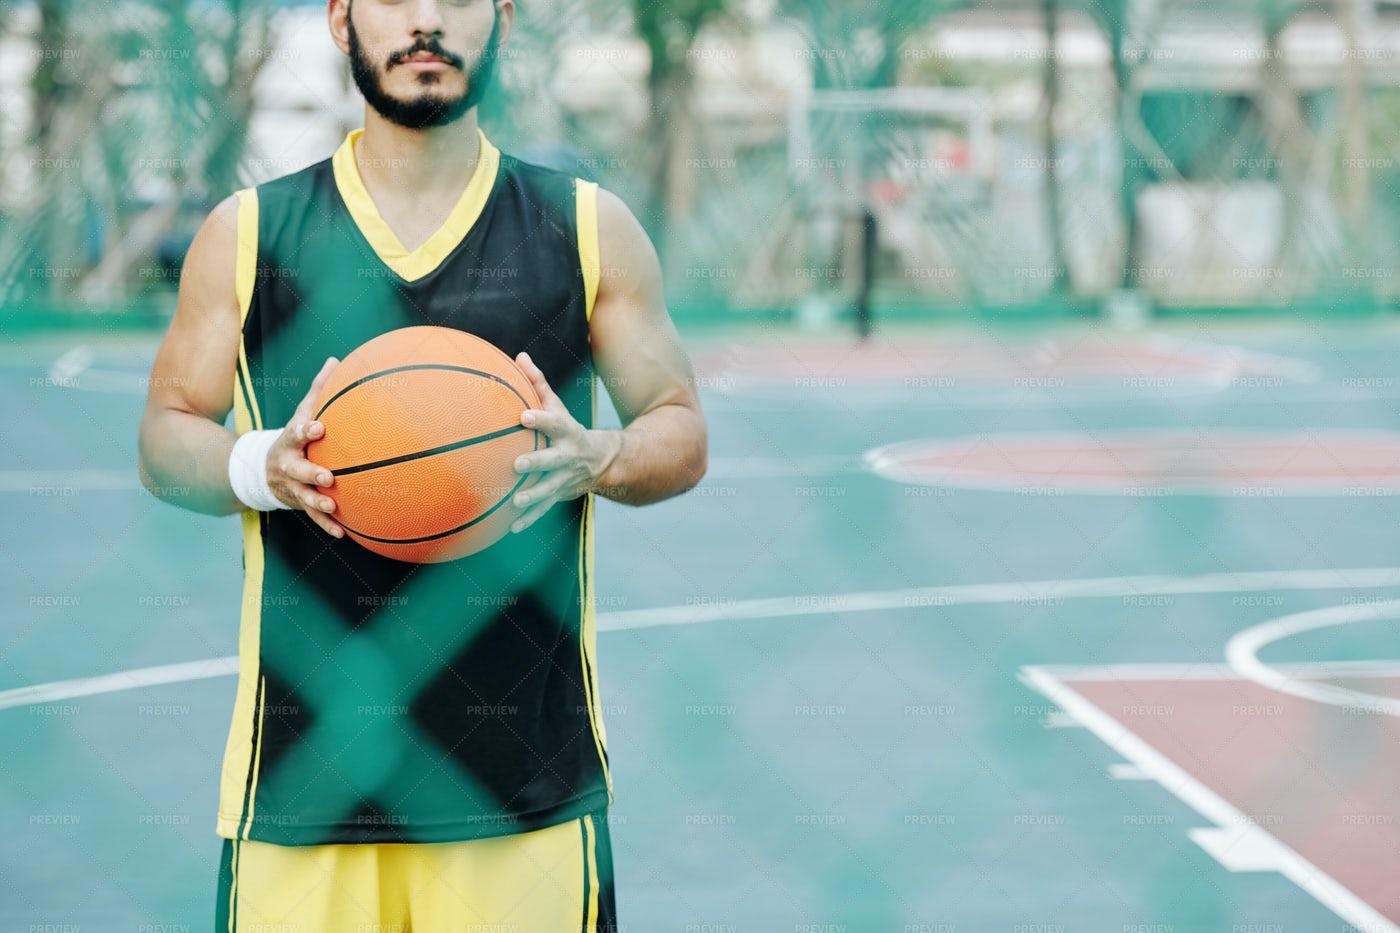 Basketball Player Holding Ball: Stock Photos